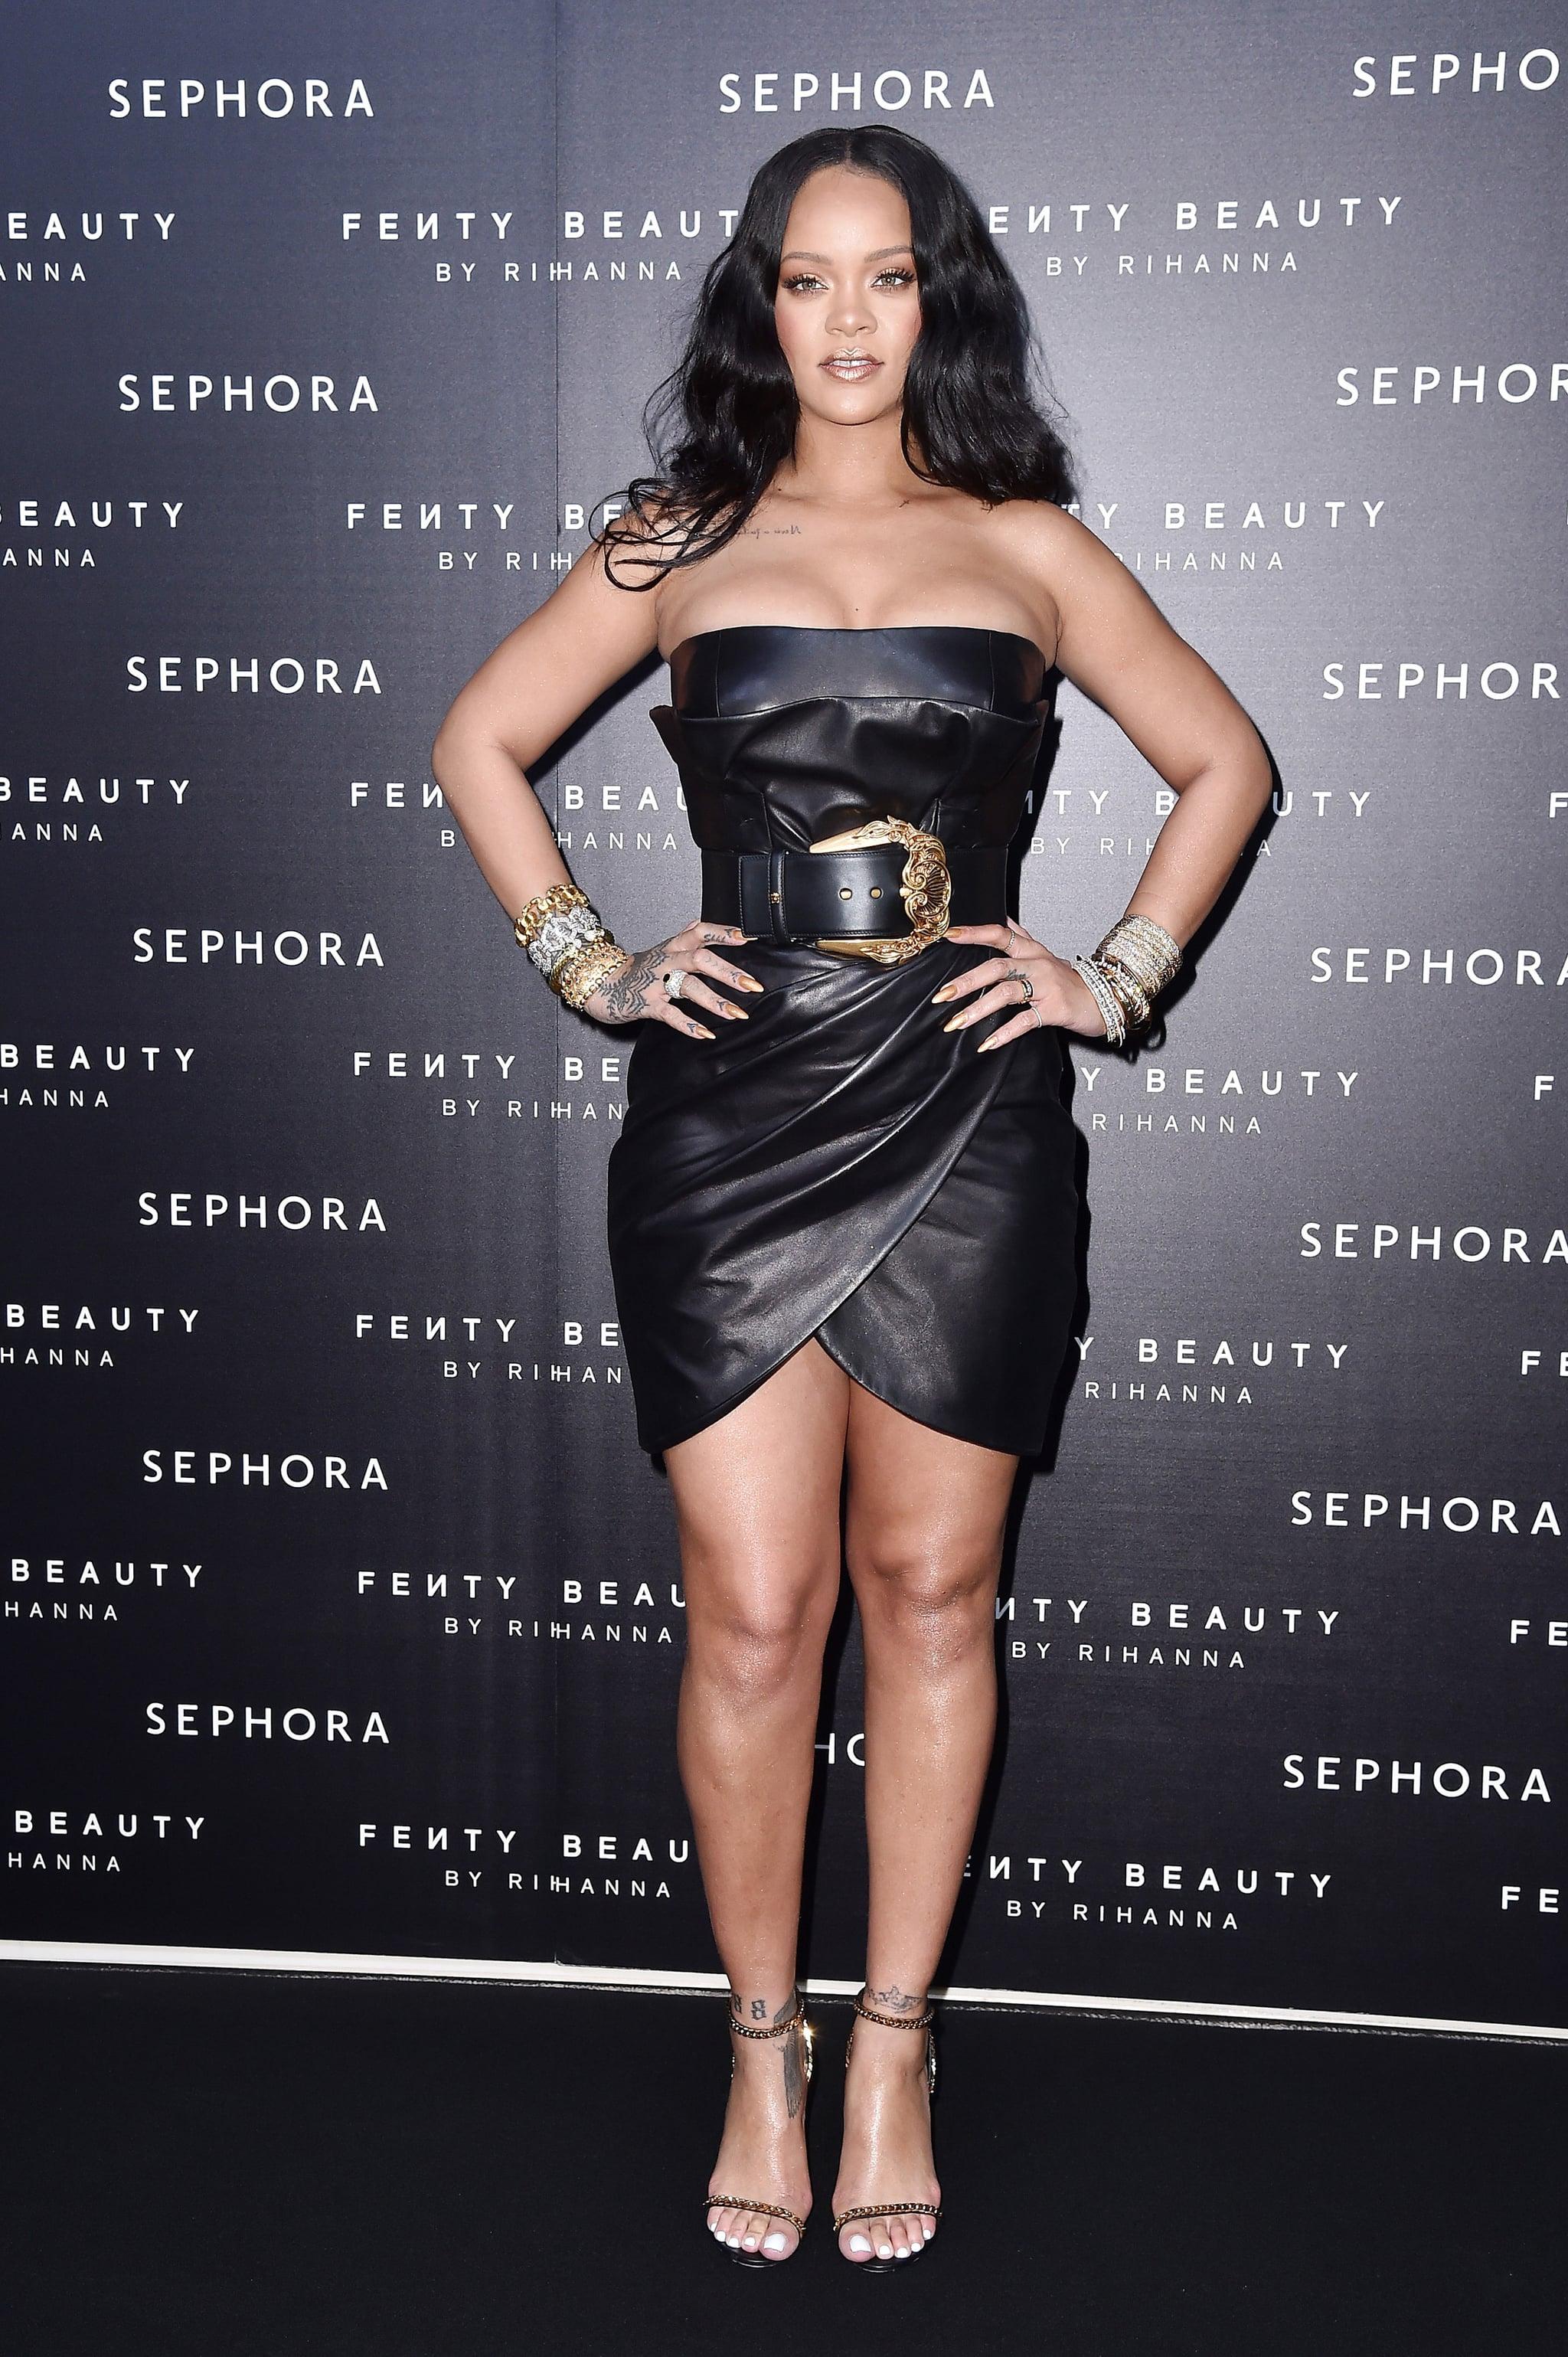 5c3105c20d585 Rihanna Diet and Workouts | POPSUGAR Fitness